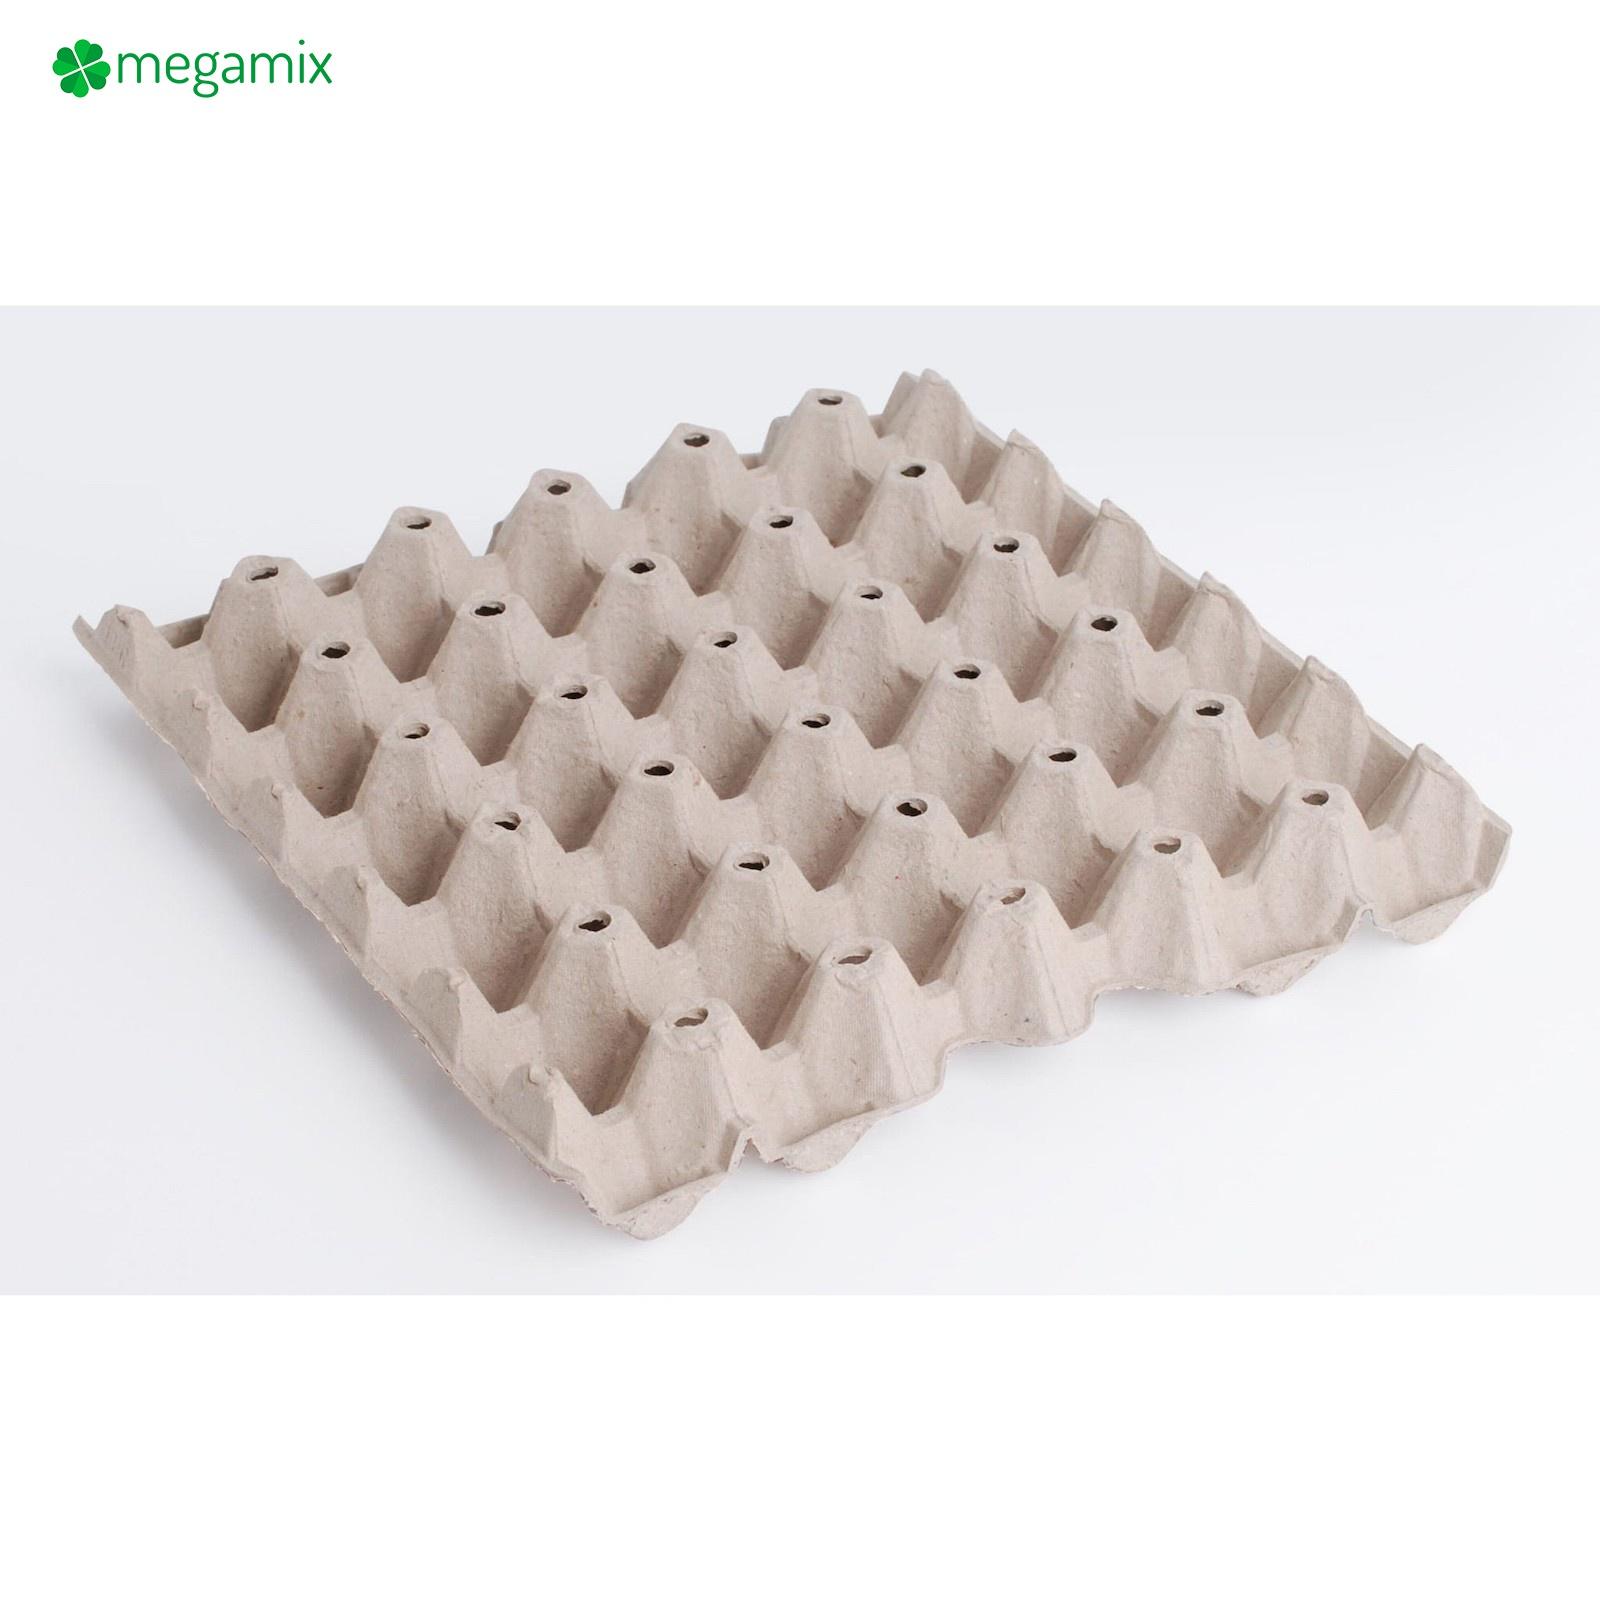 obaly na vajcia preložky na 30ks set 100ks 297x295x47mm šedé megamix.sk